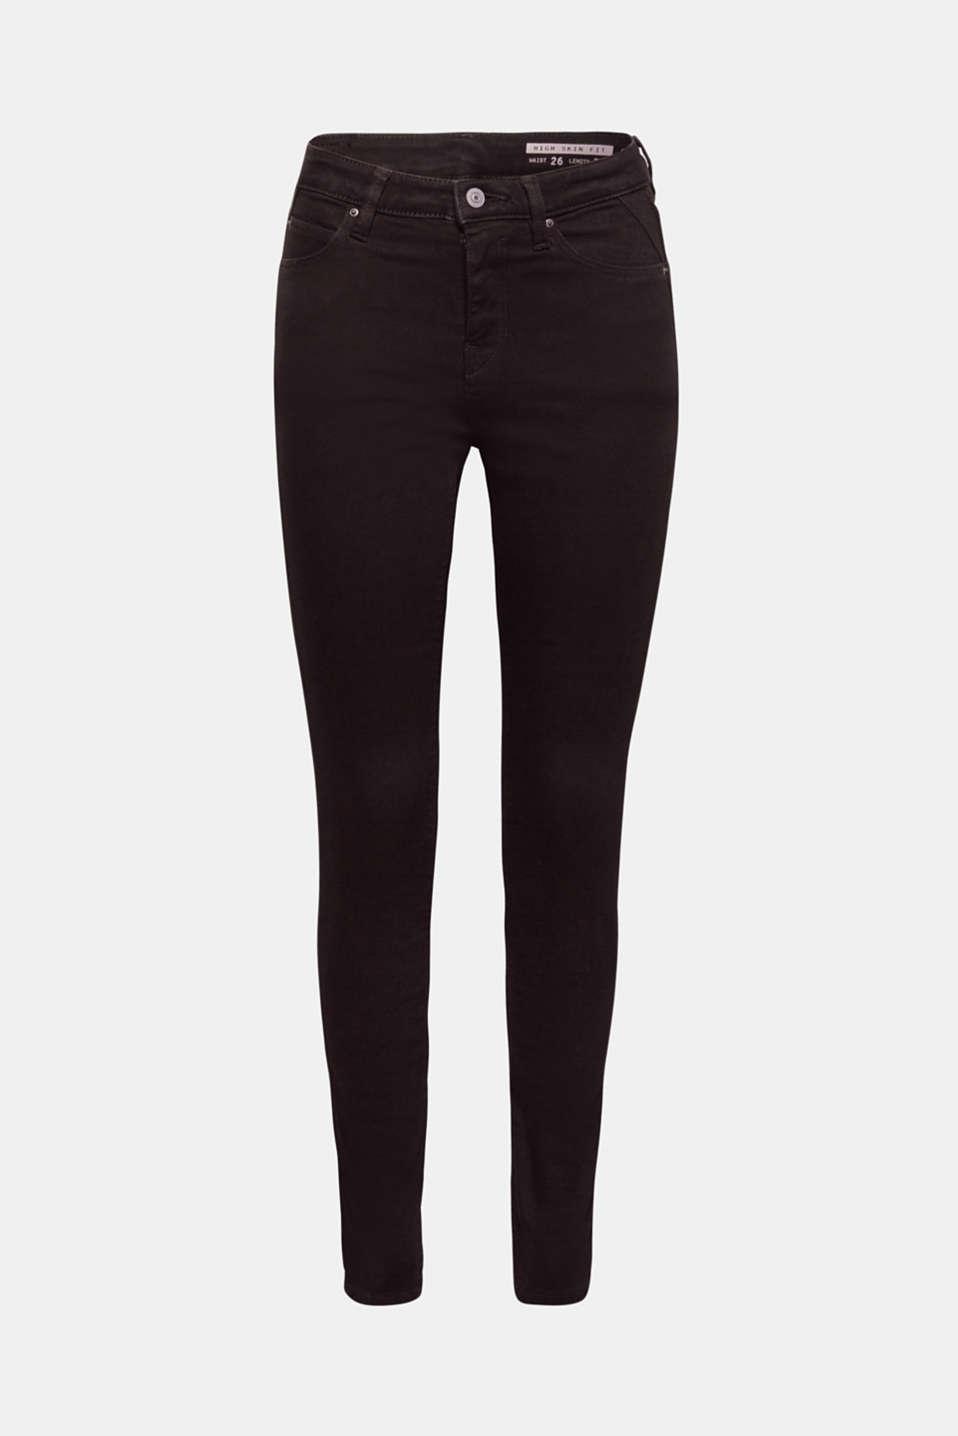 edc Stretch Jeans mit hohem Bund, Recycled im Online Shop